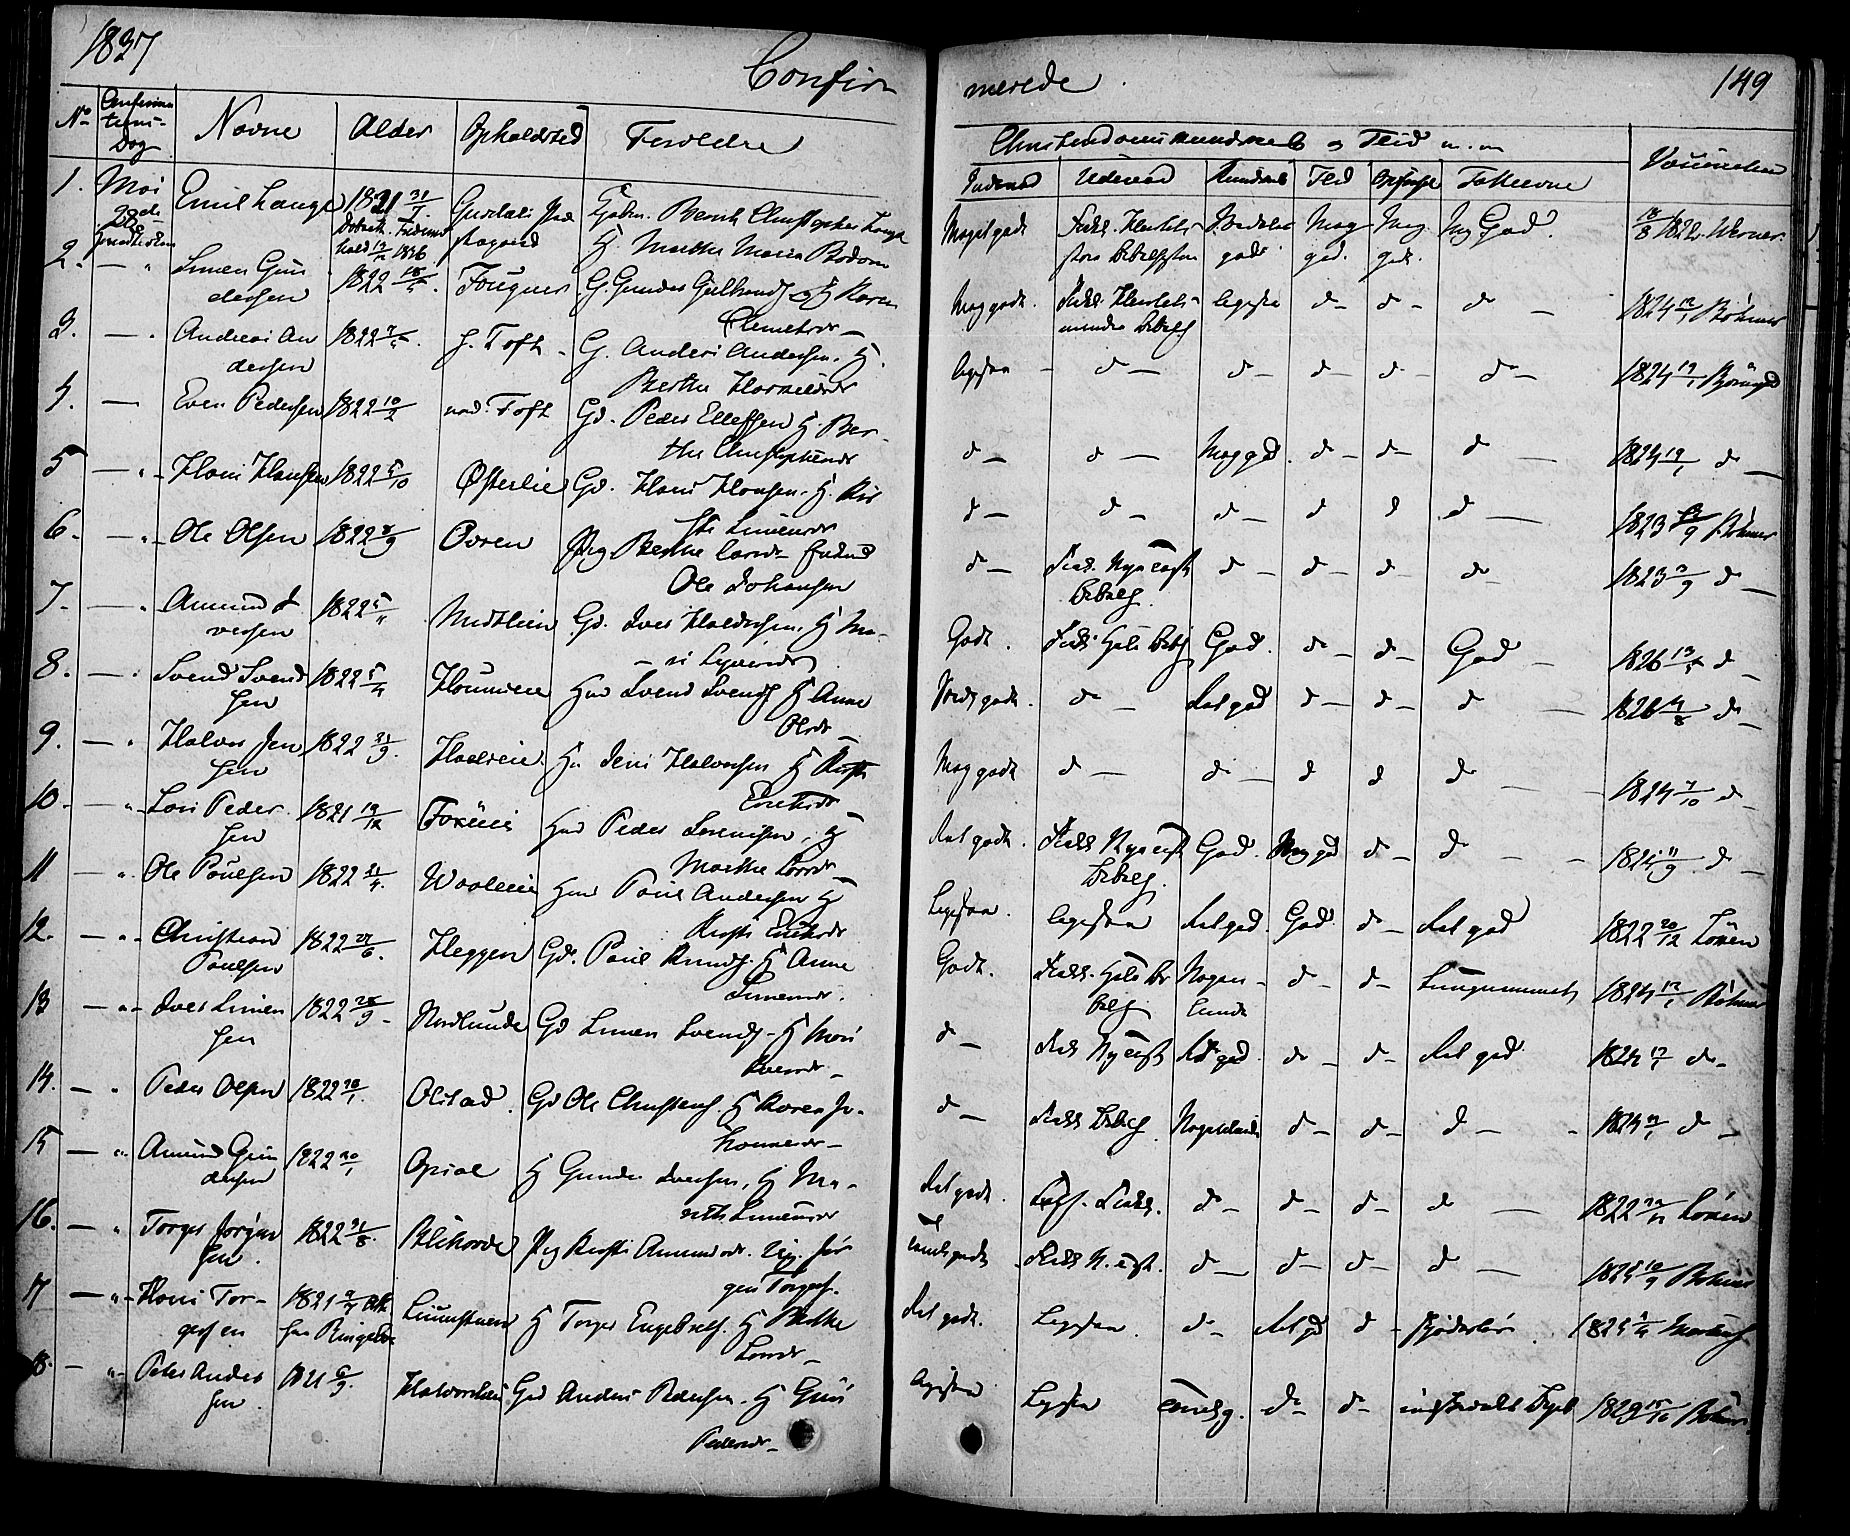 SAH, Gausdal prestekontor, Ministerialbok nr. 6, 1830-1839, s. 149